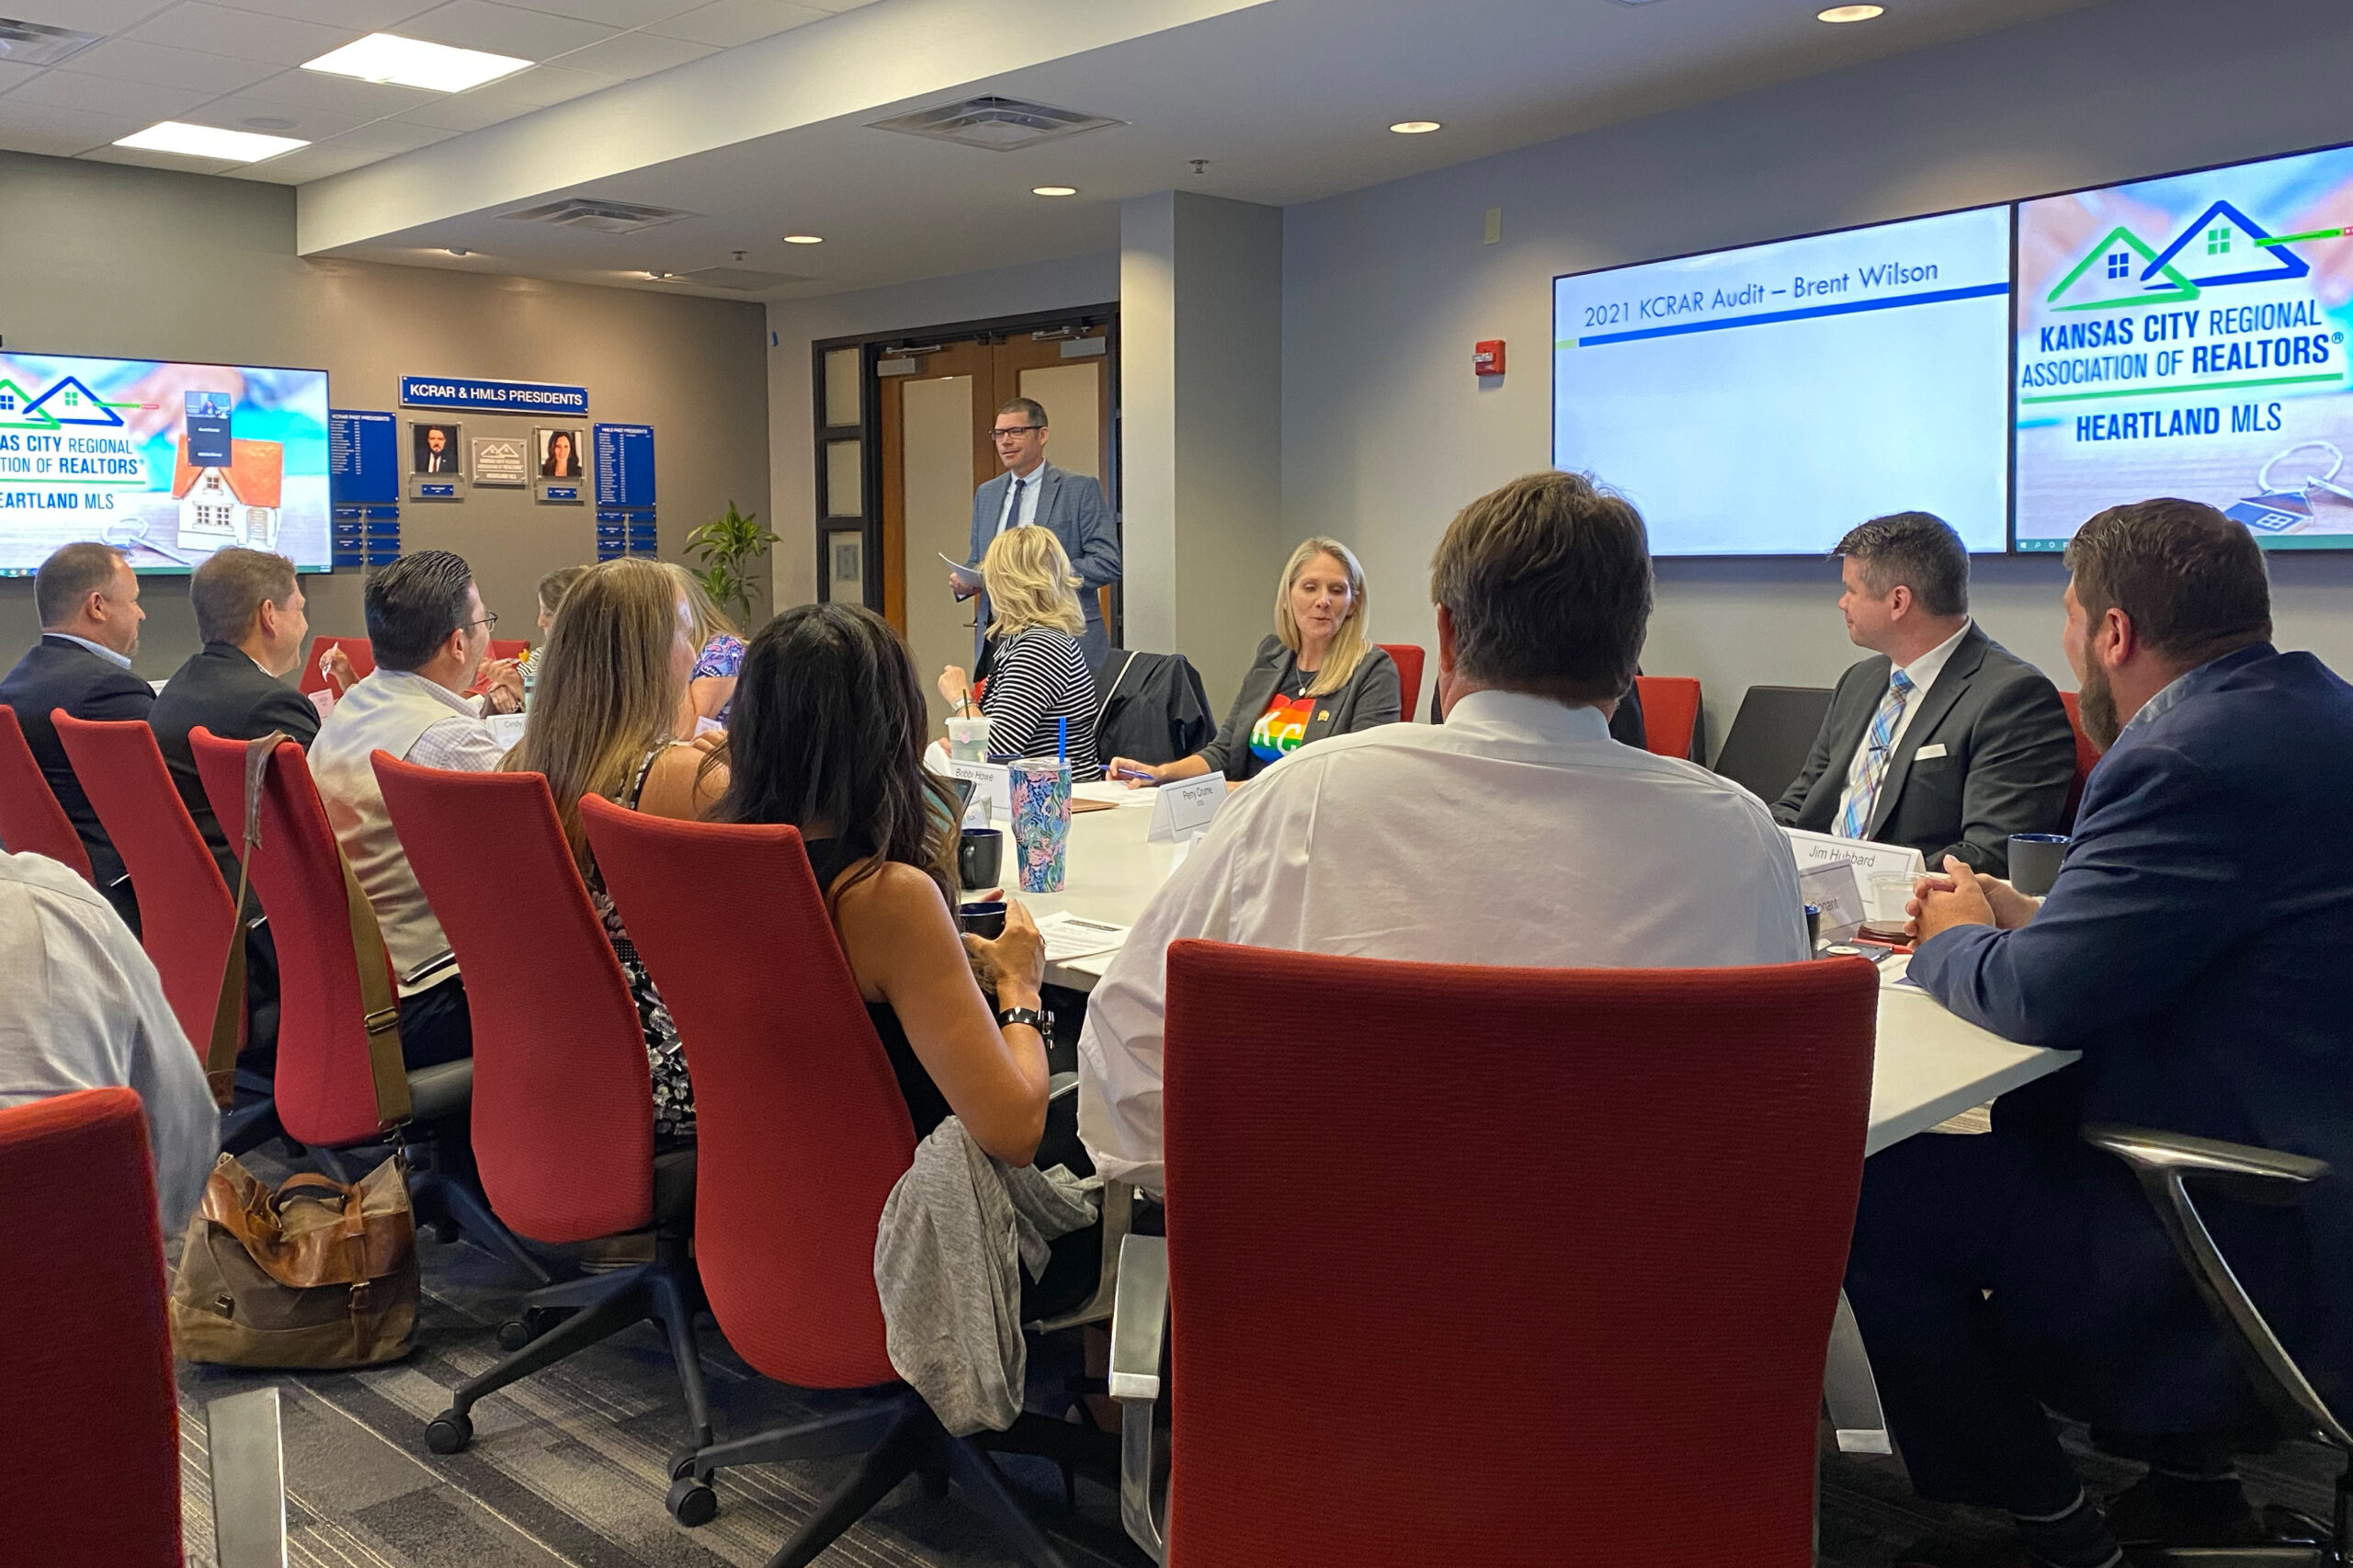 Photo description: KCRAR Board of Directors meeting in KCRAR Board Room.